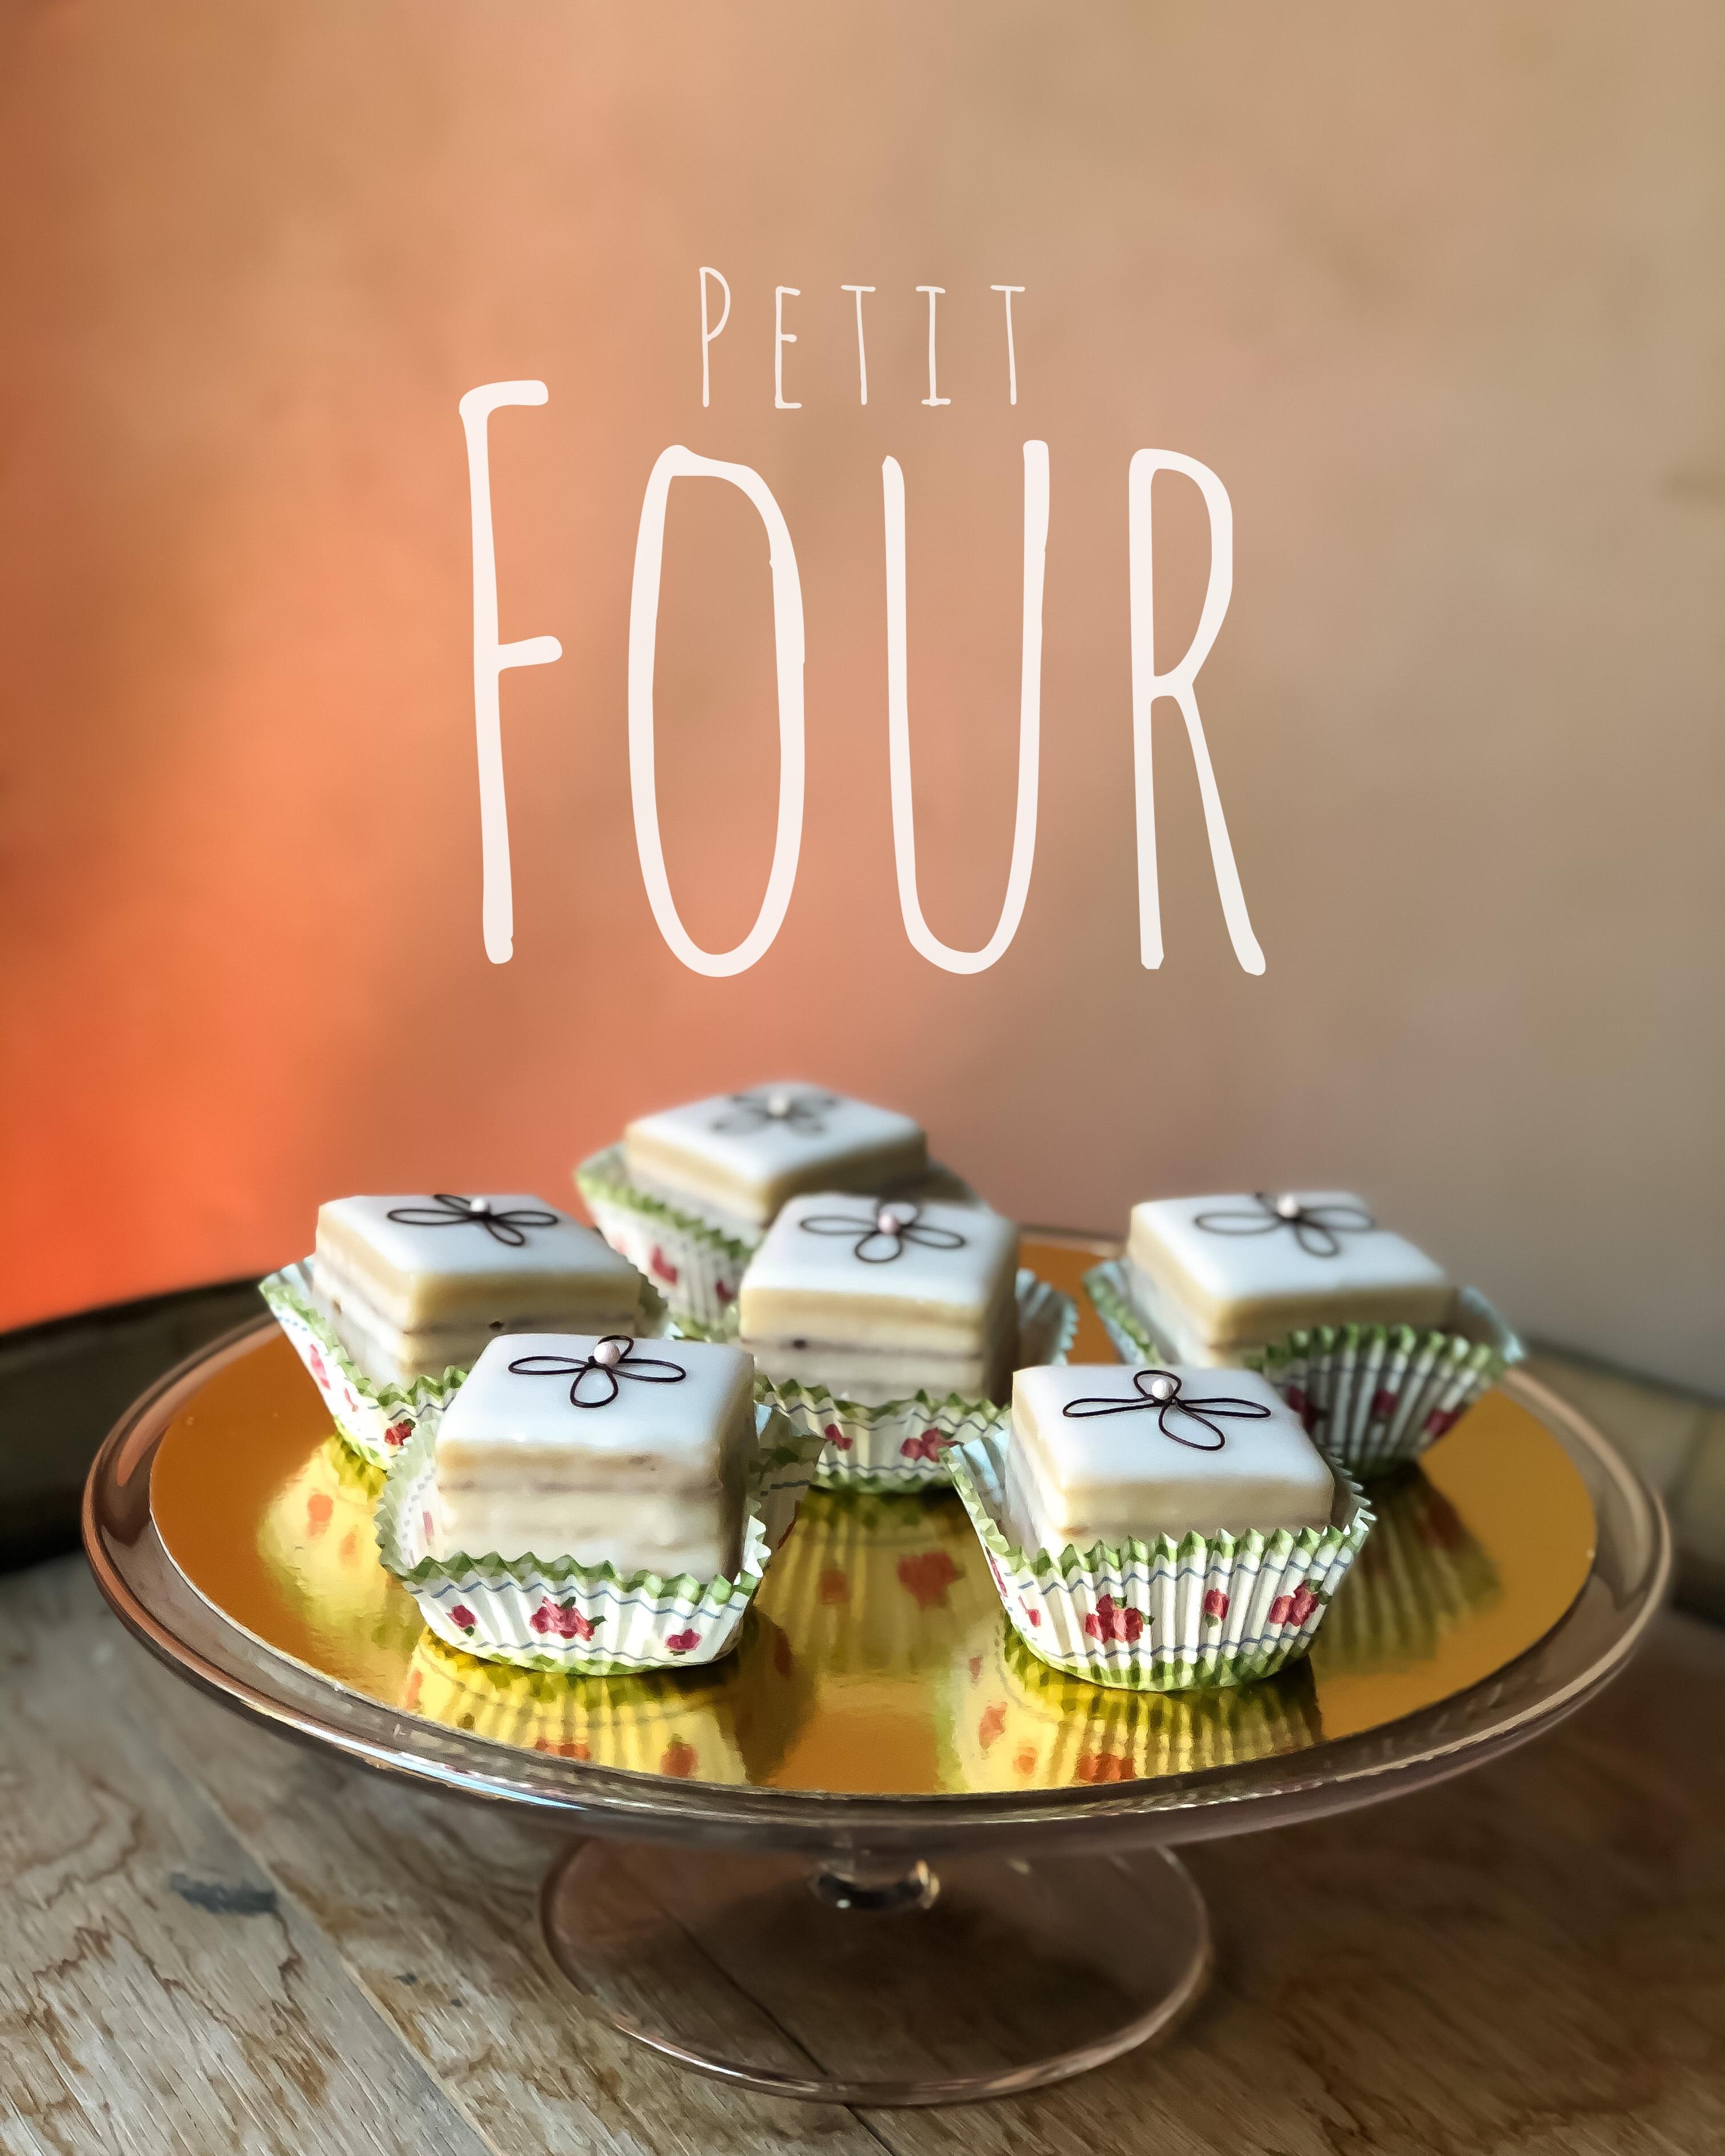 16. Petit Four